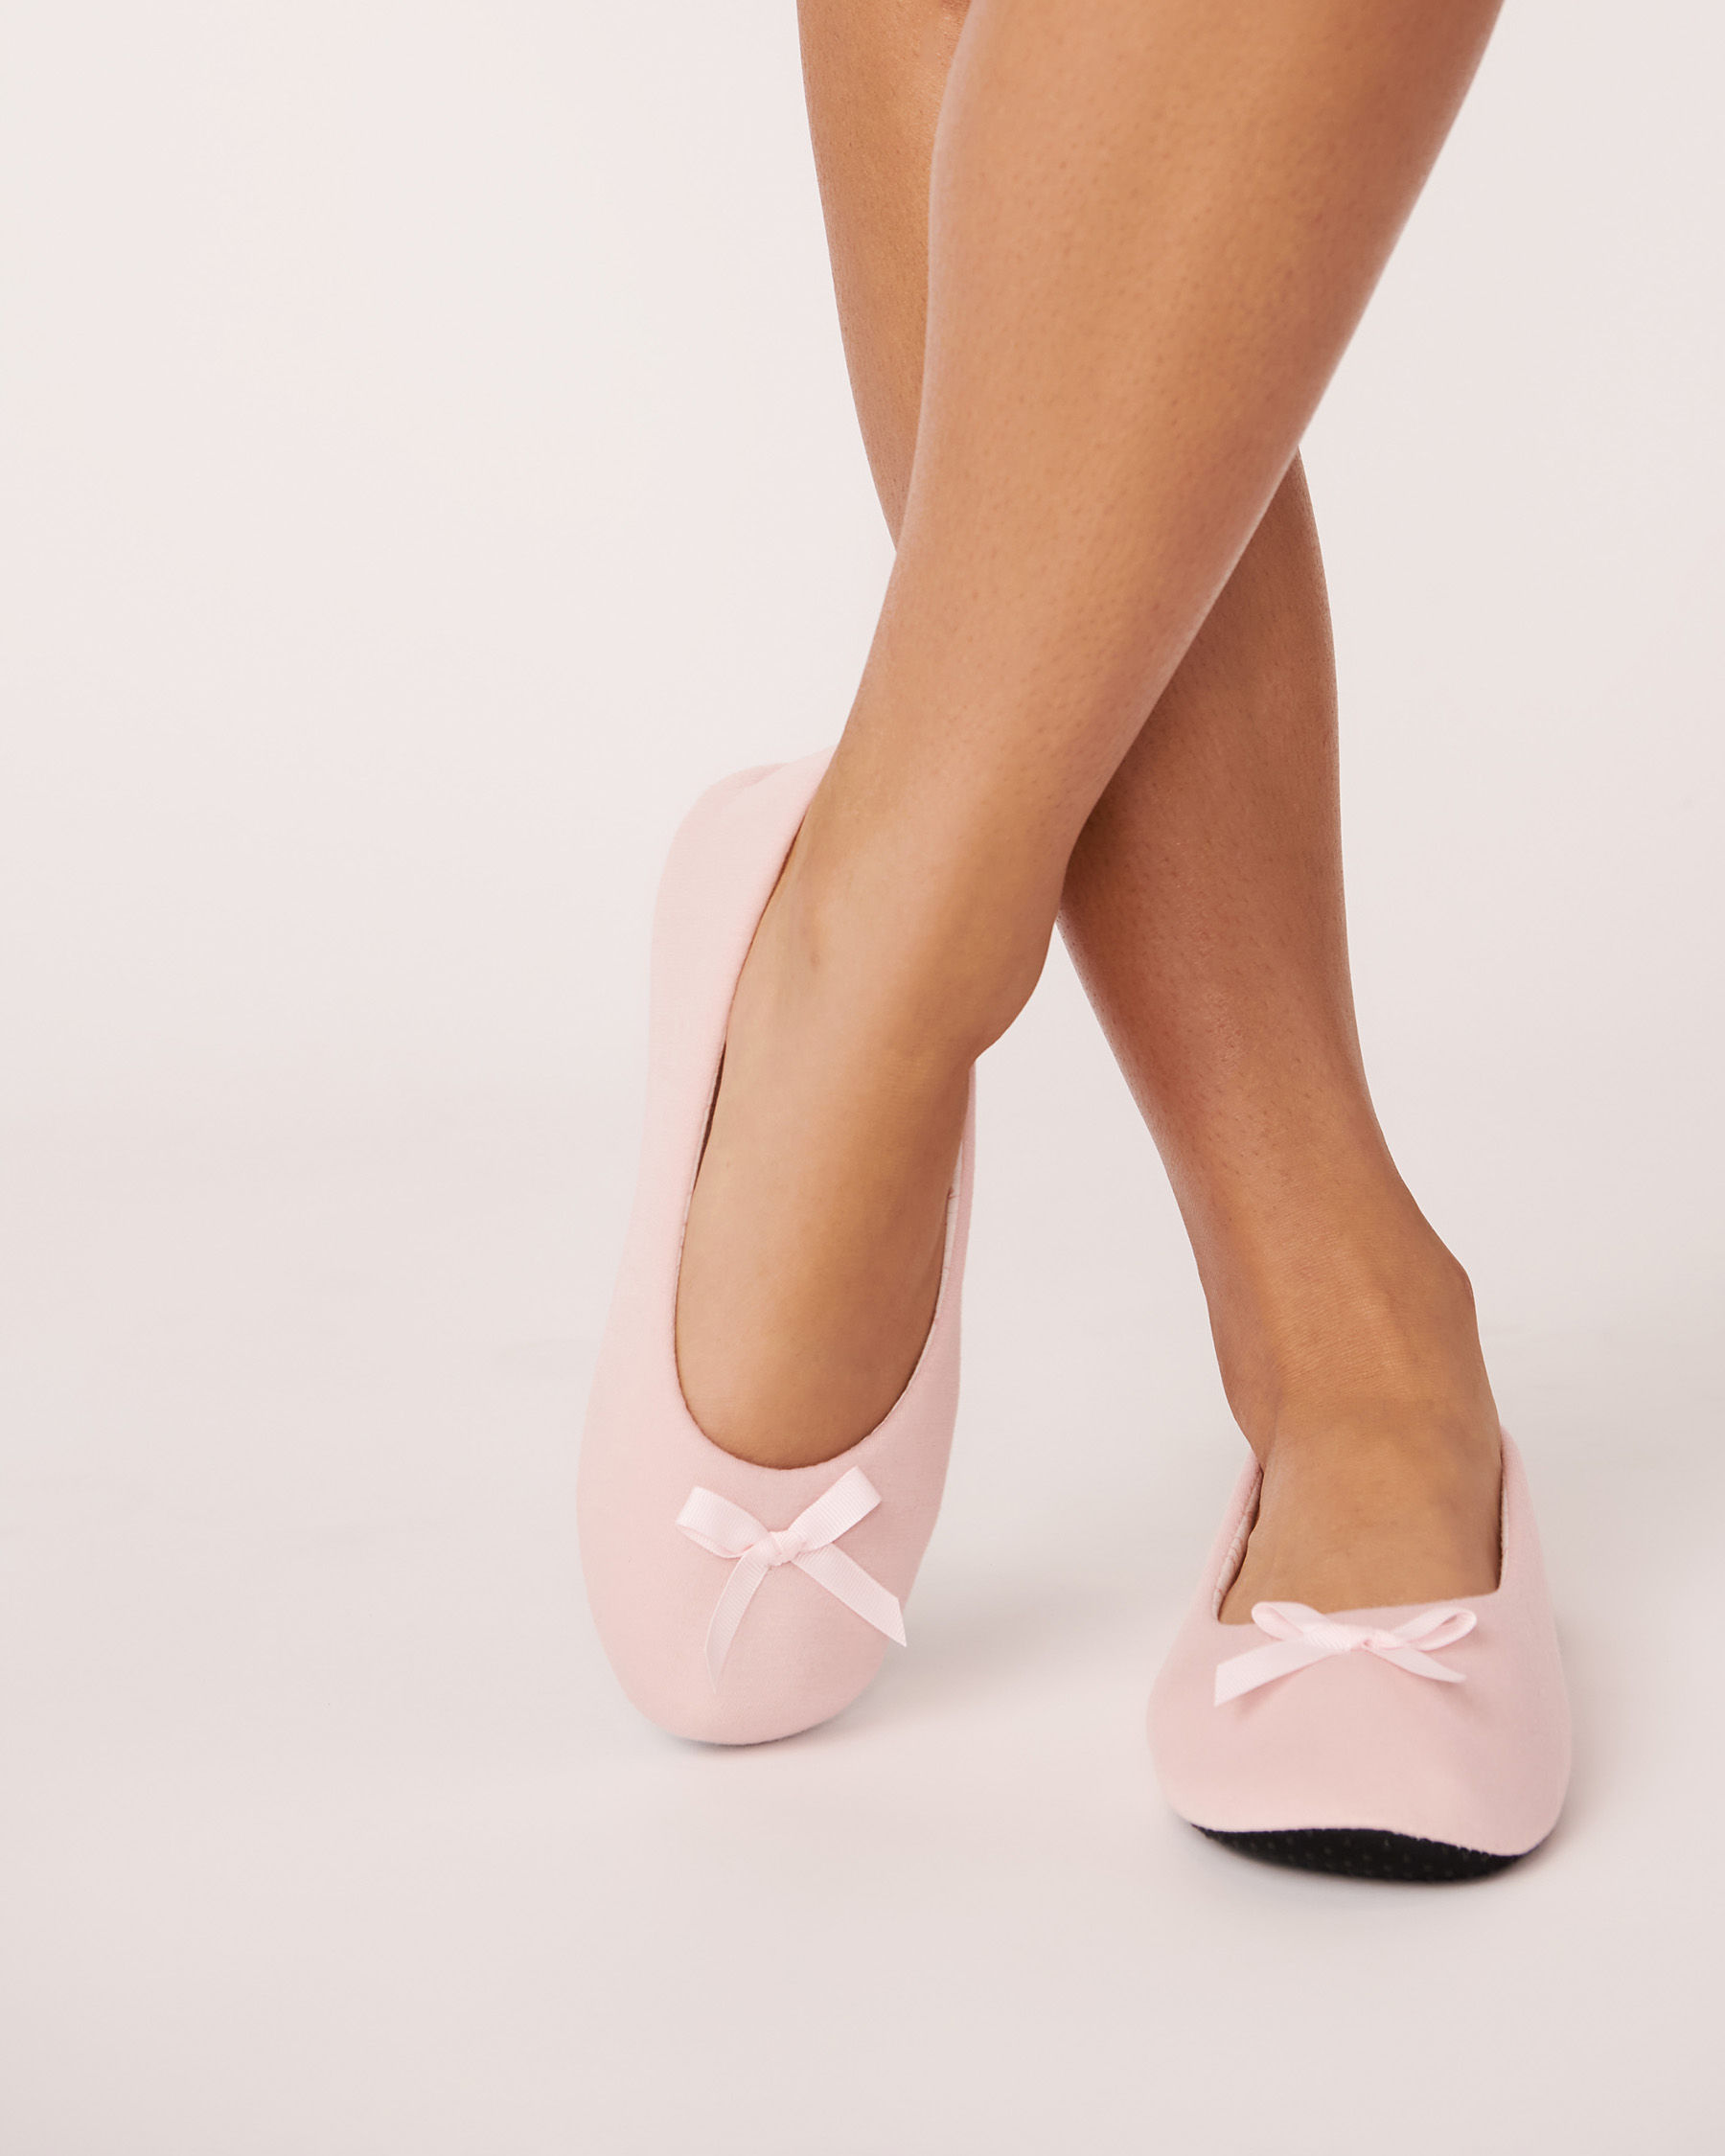 LA VIE EN ROSE Ballerina Slippers Pink 894-551-0-11 - View1